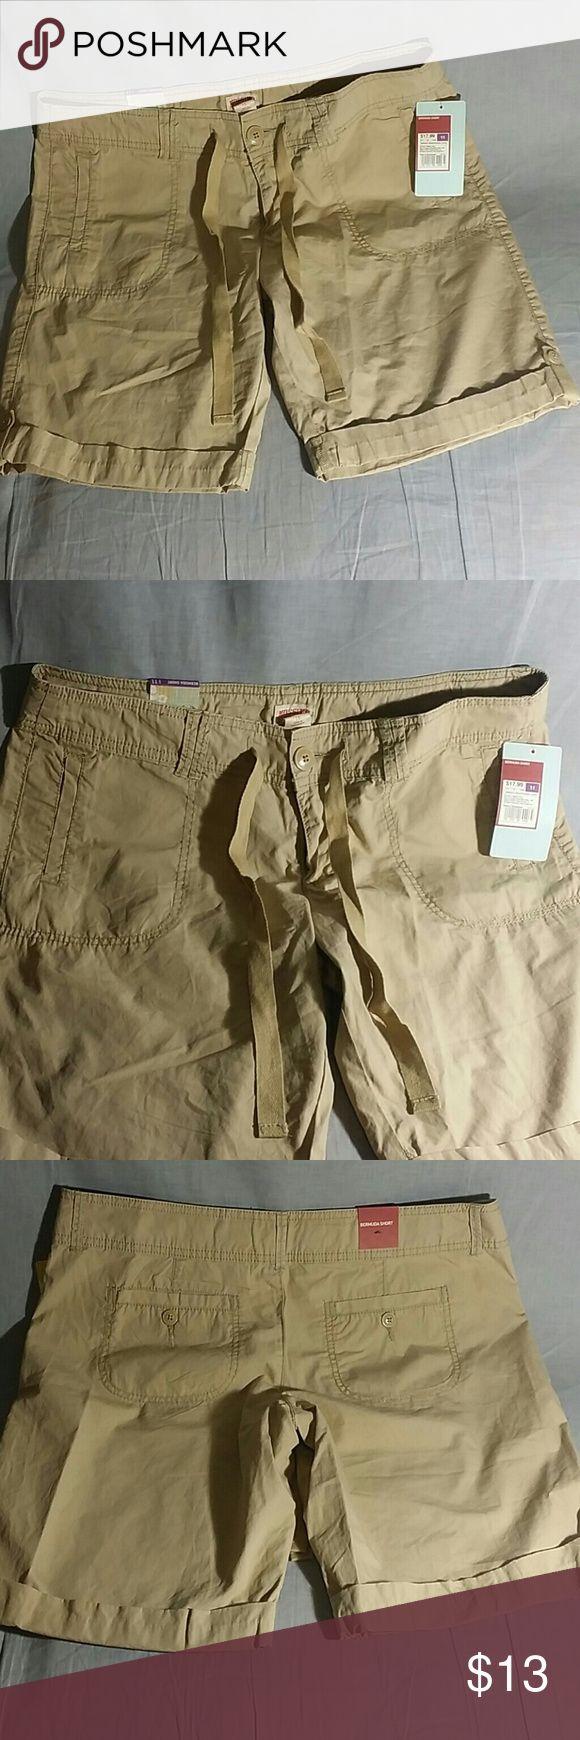 "MOSSIMO Bermuda Shorts Pants Tan Size 11 Cotton Women's Shorts Item is NEW measurements 17"" INSEAM 9.5"" TALL 17"" 100% cotton. Mossimo Supply Co Shorts Bermudas"